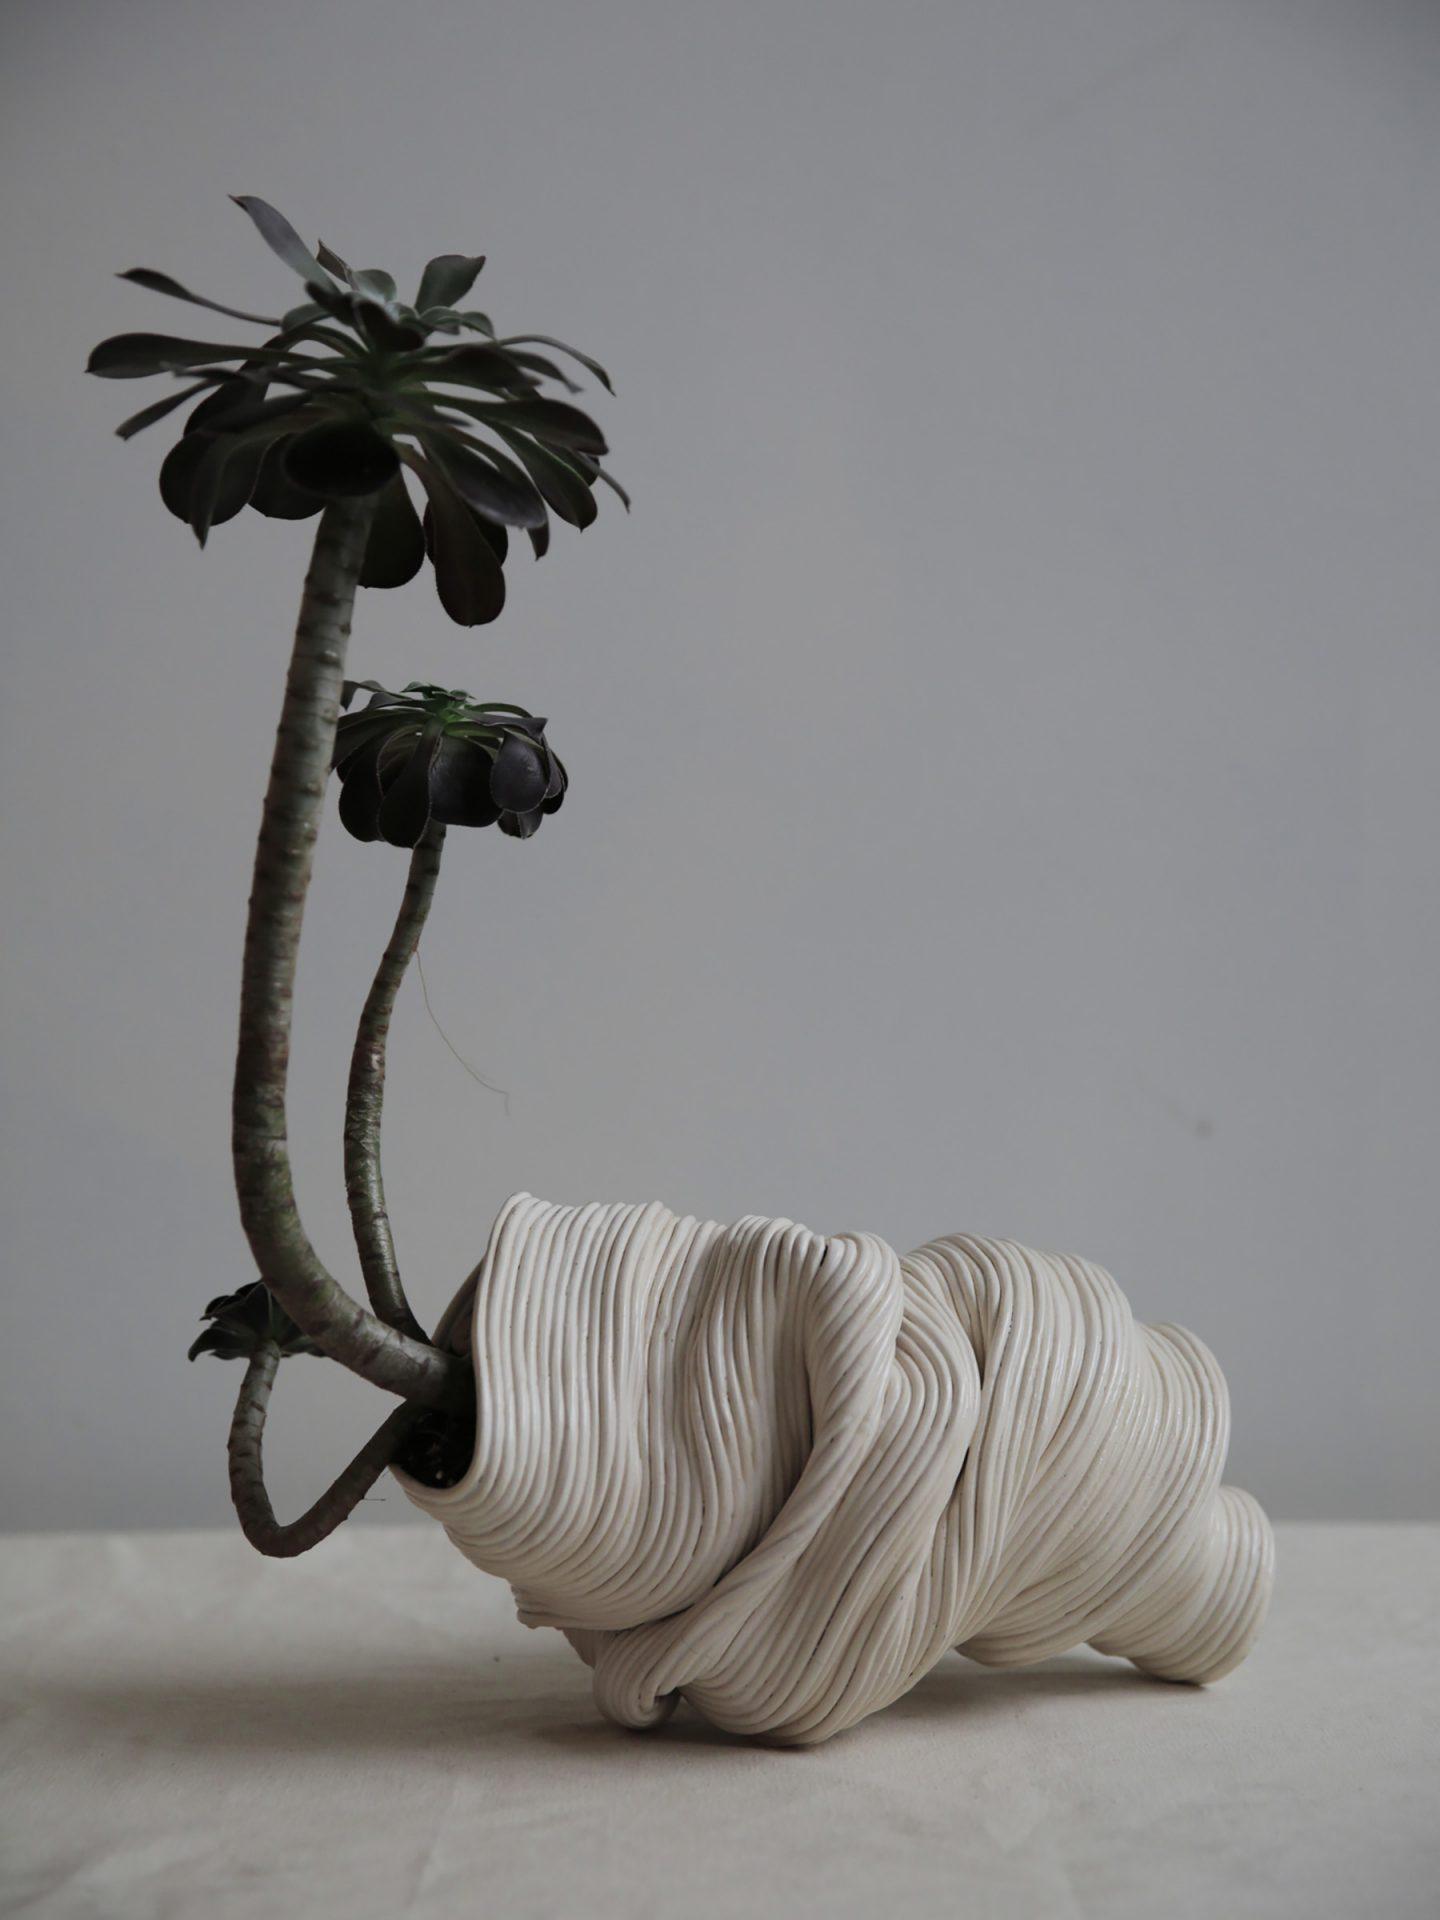 iGNANT-Design-Zhu-Ohmu-Plantsukuroi-05